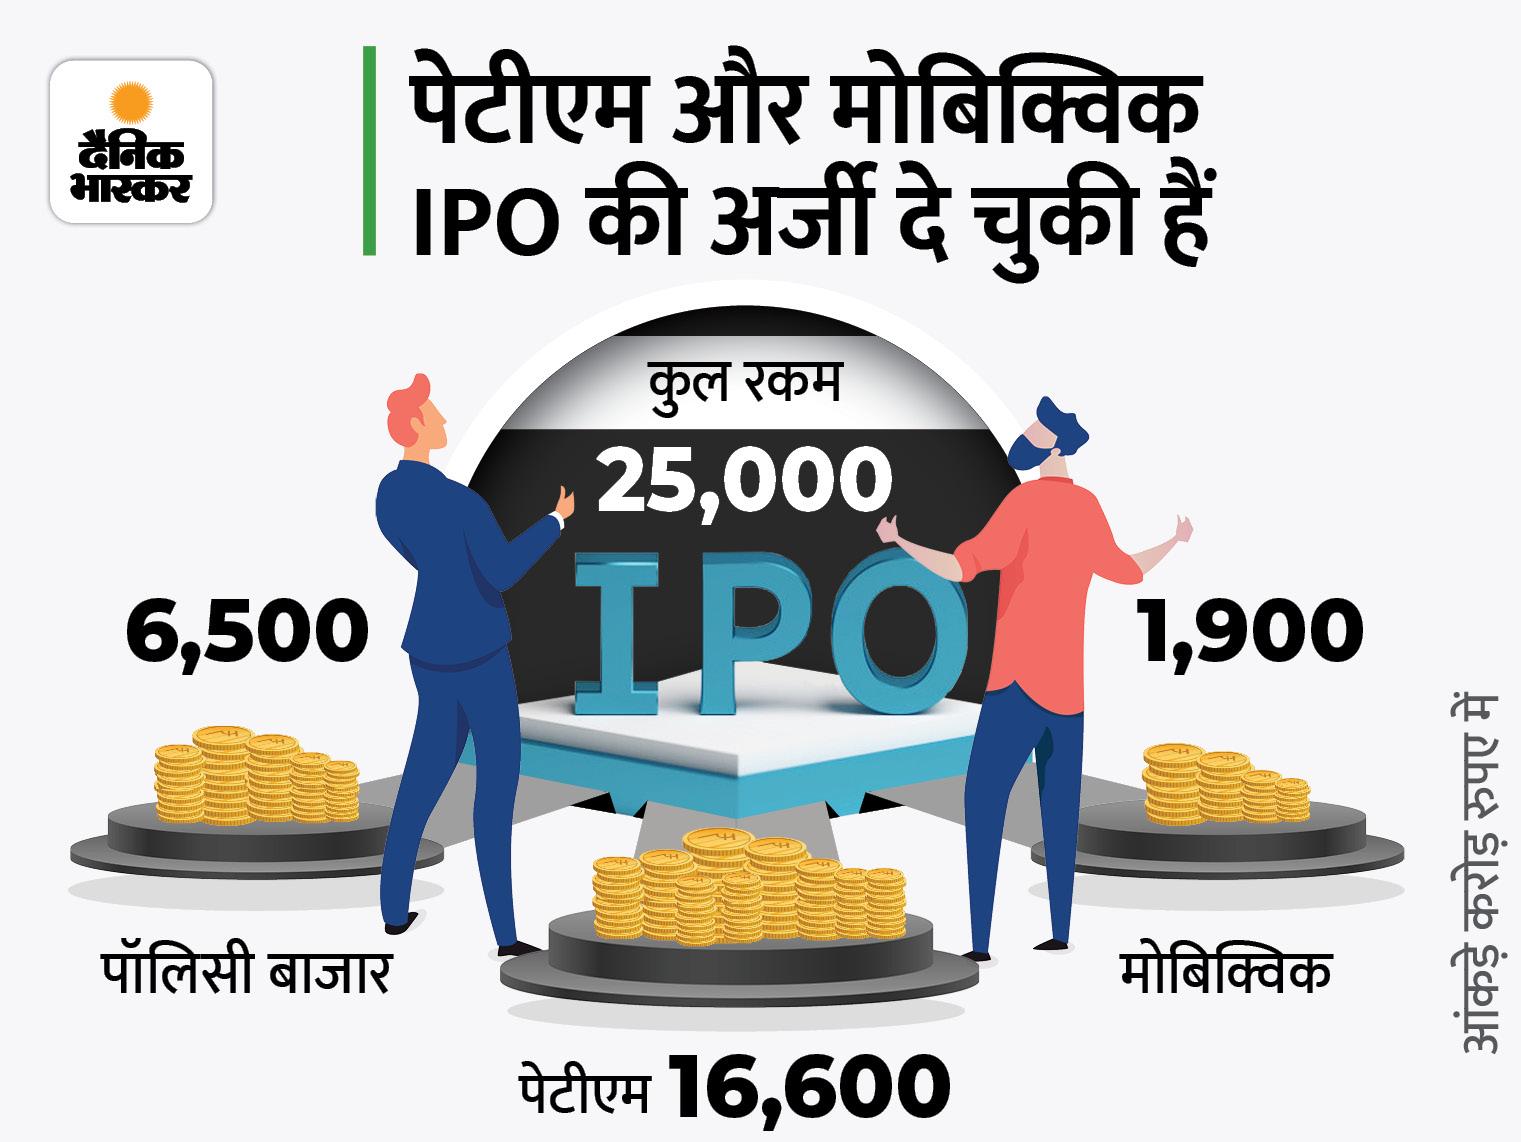 पेटीएम, पॉलिसीबाजार और मोबिक्विक जुटाएंगी 25 हजार करोड़, पॉलिसी बाजार सेबी को जल्द देगी IPO के लिए अर्जी|बिजनेस,Business - Dainik Bhaskar